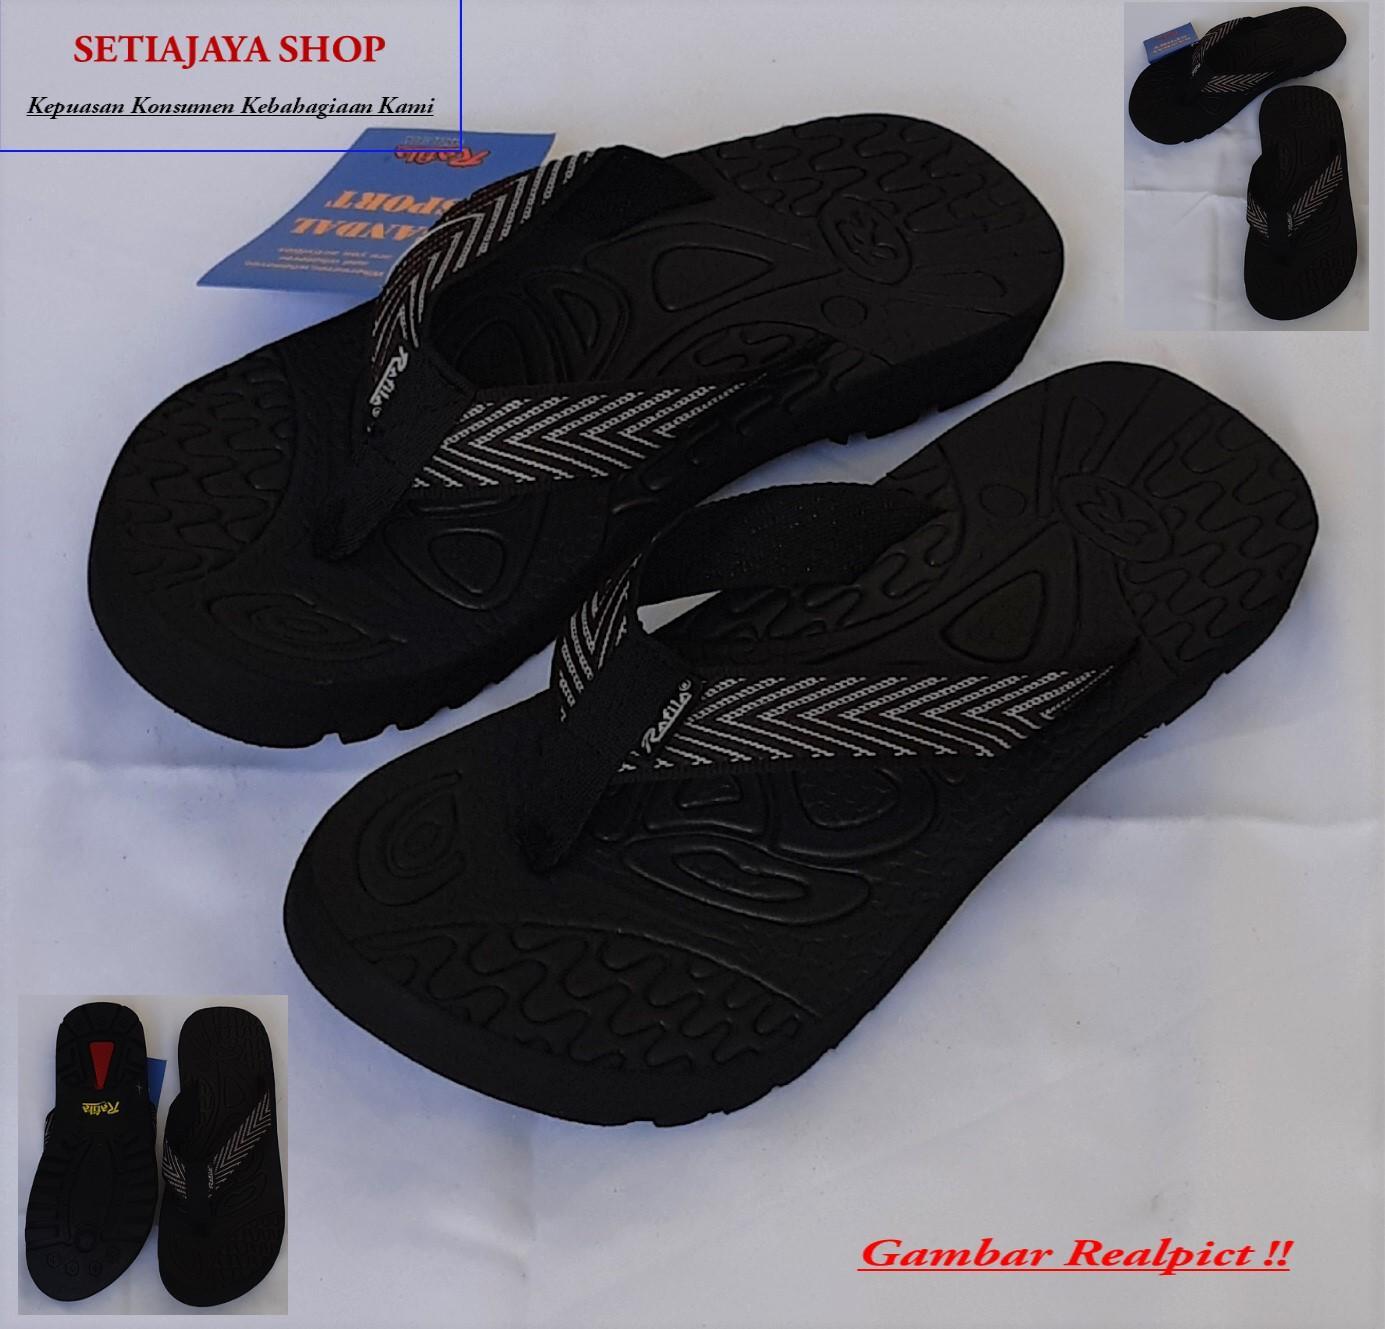 Sandal Gunung Rafila Jepit Cewek/Cowok Original -JP-Setiajaya shop